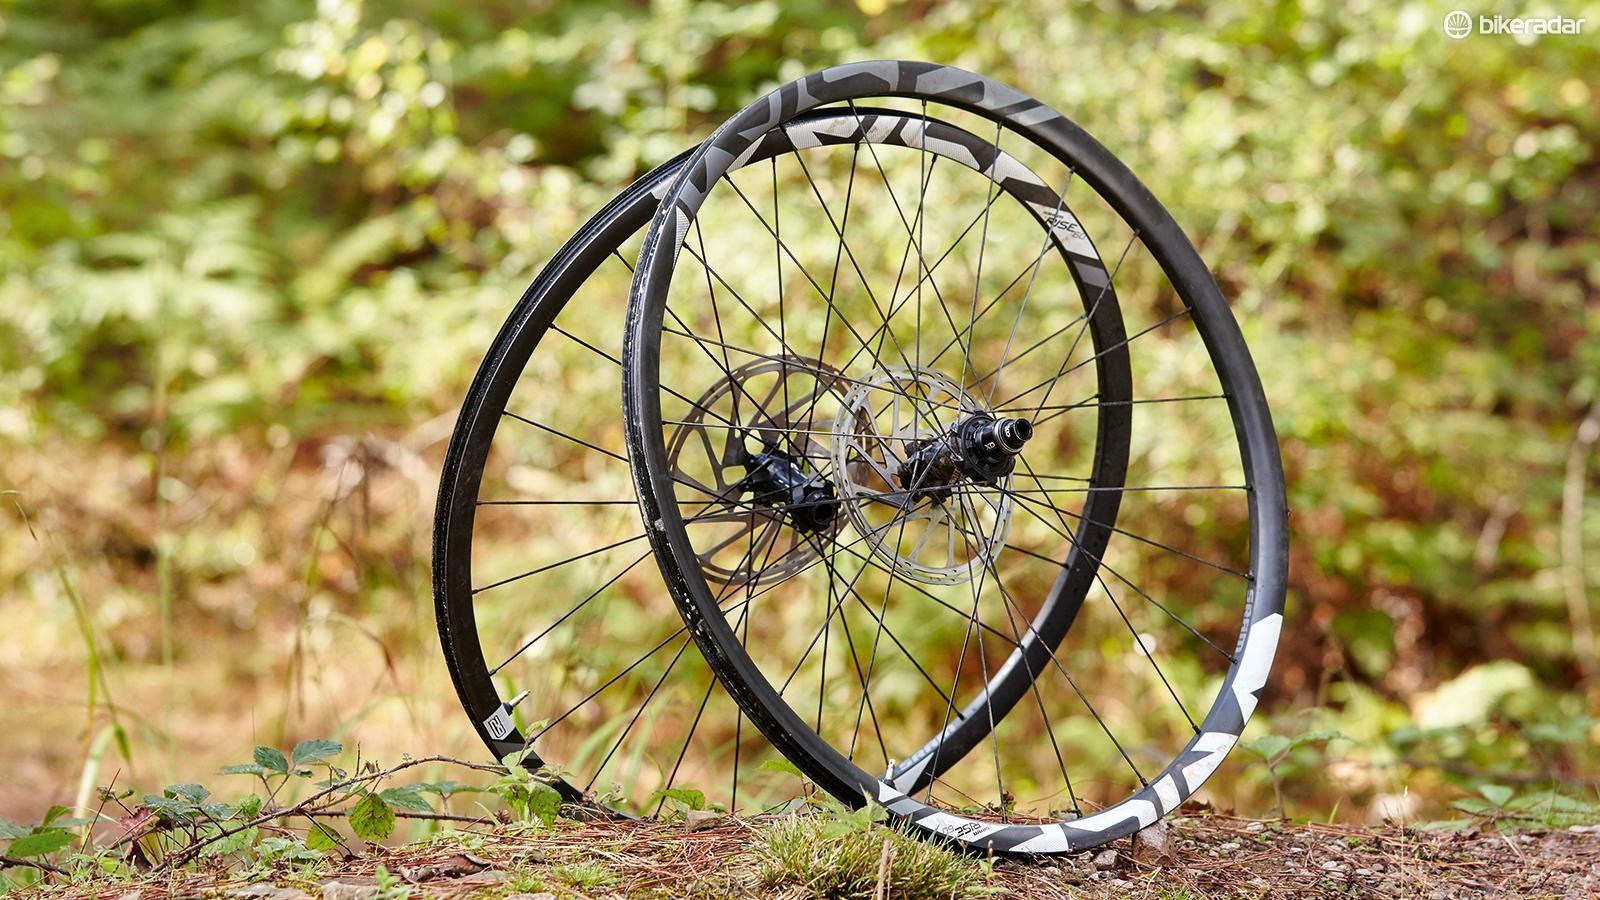 SRAM RISE 60 29in wheels